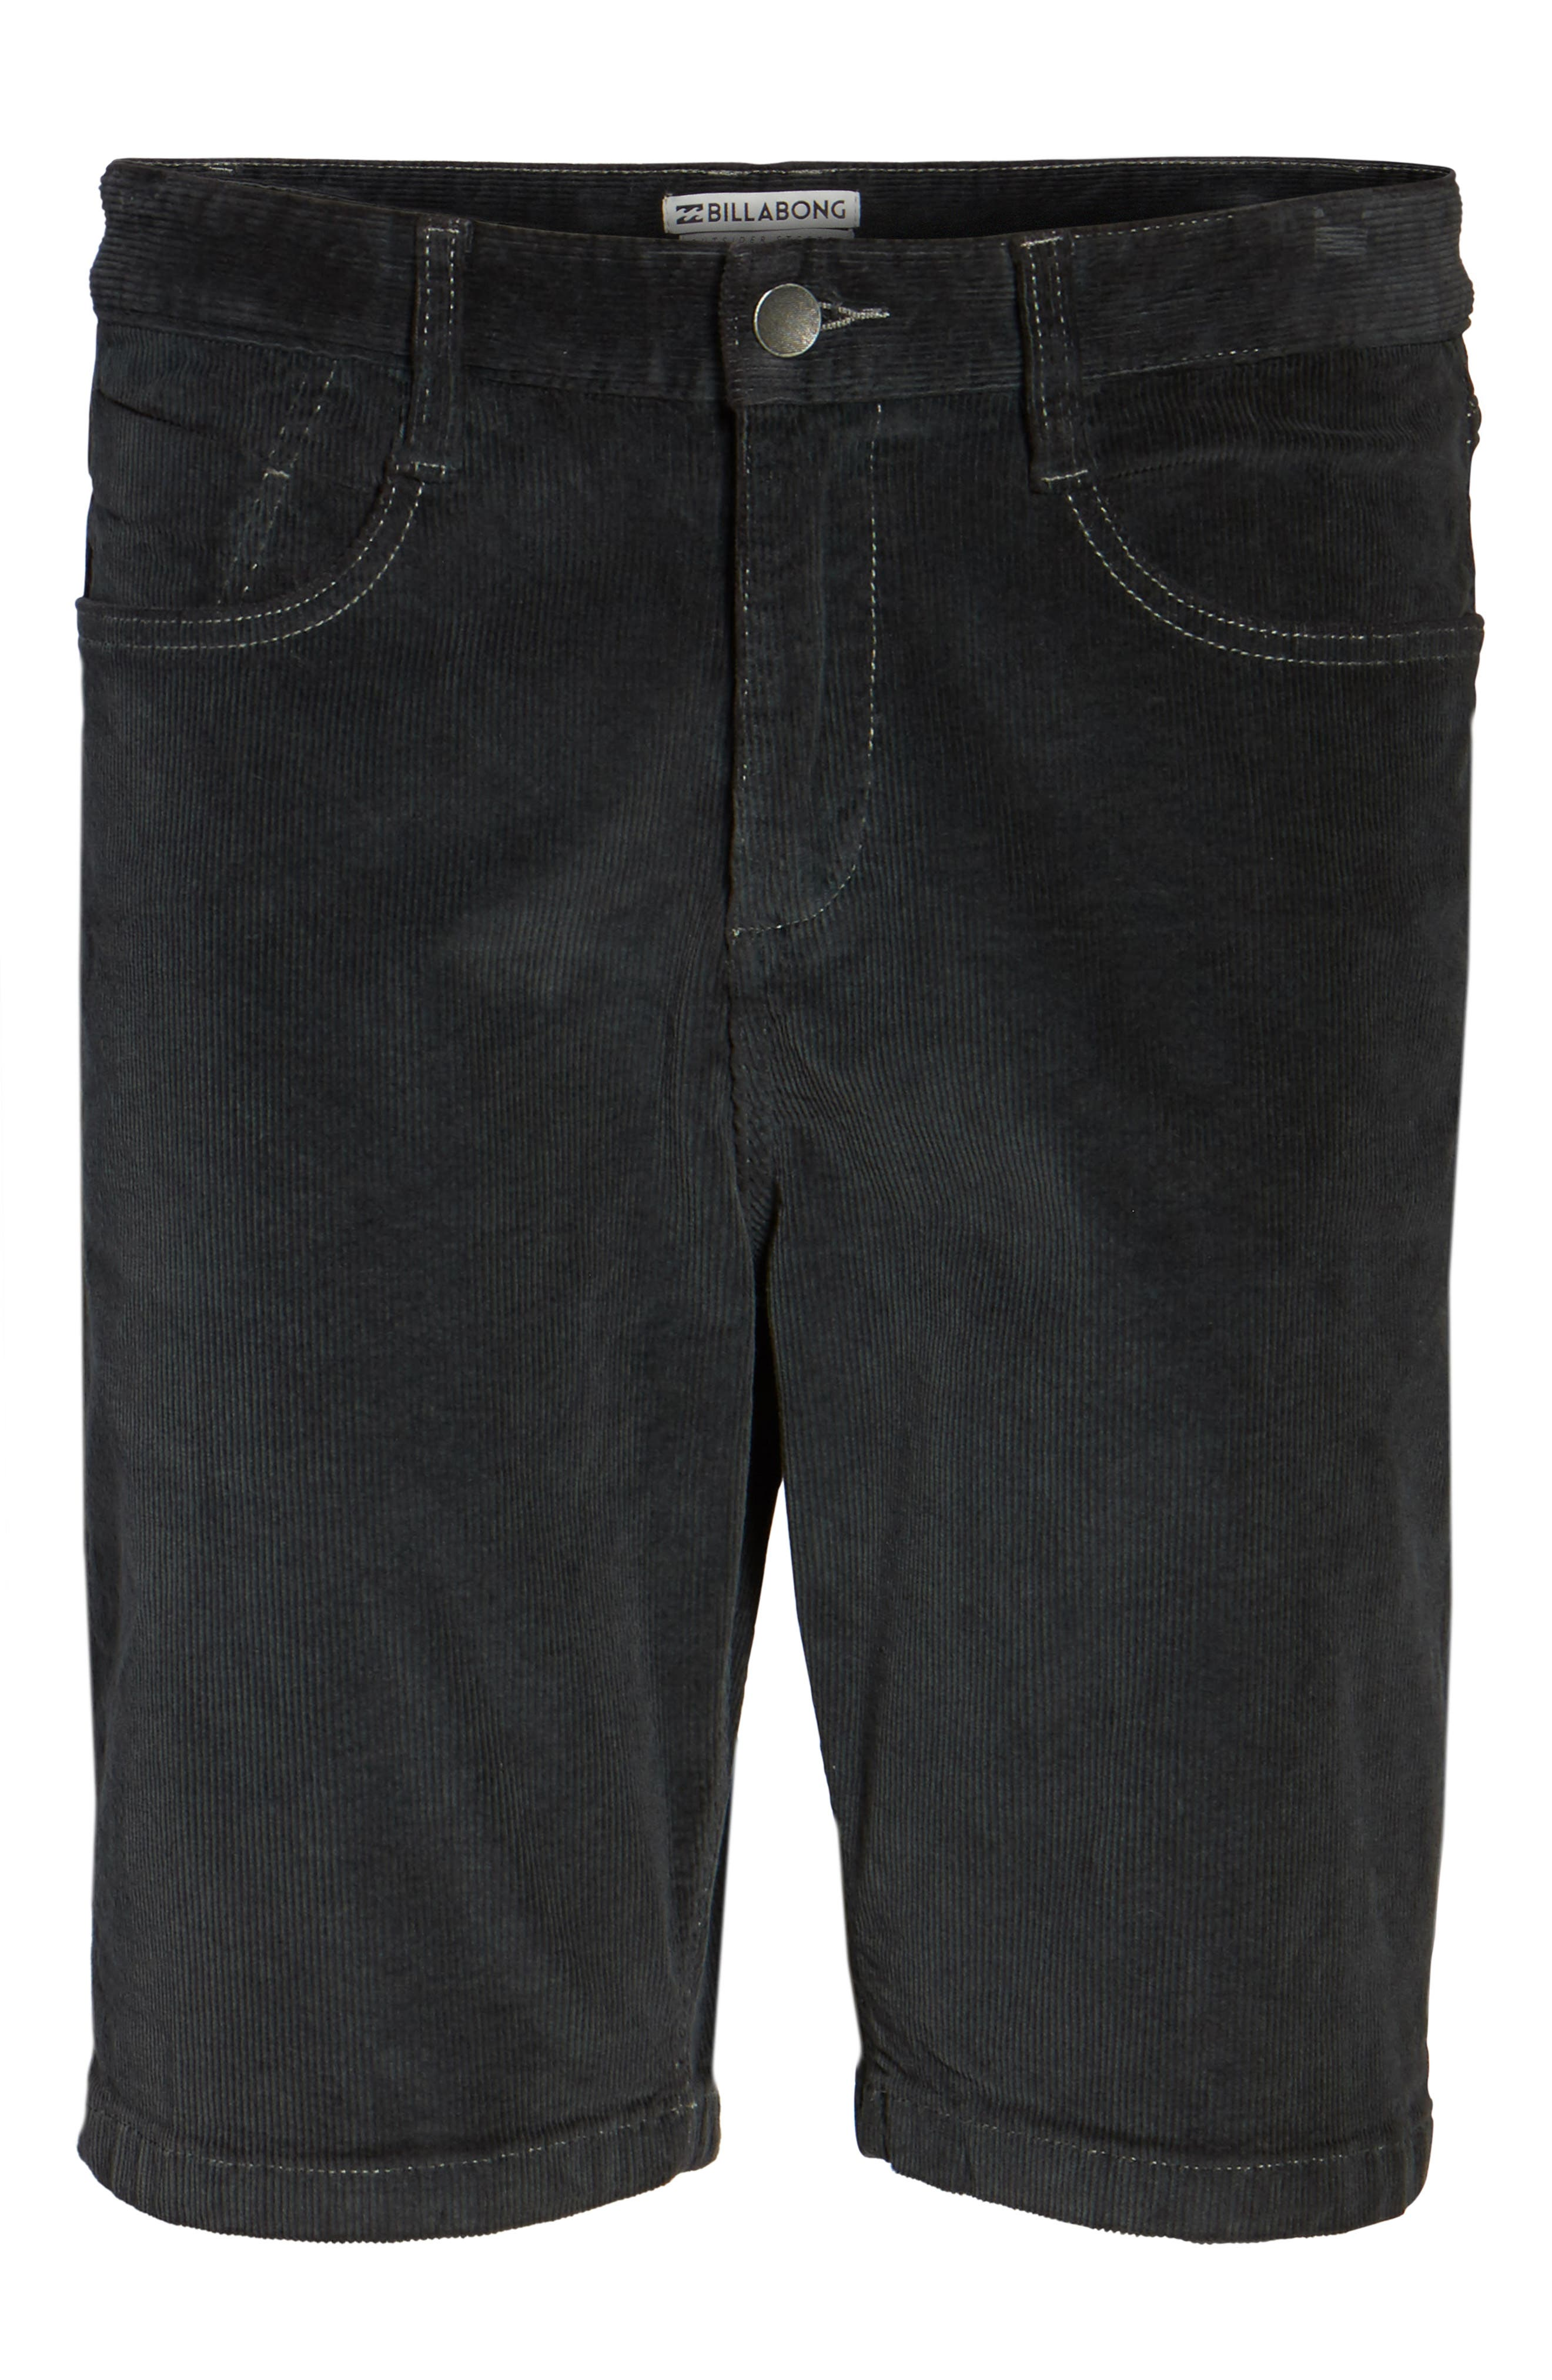 Outsider Corduroy Shorts,                             Alternate thumbnail 6, color,                             010